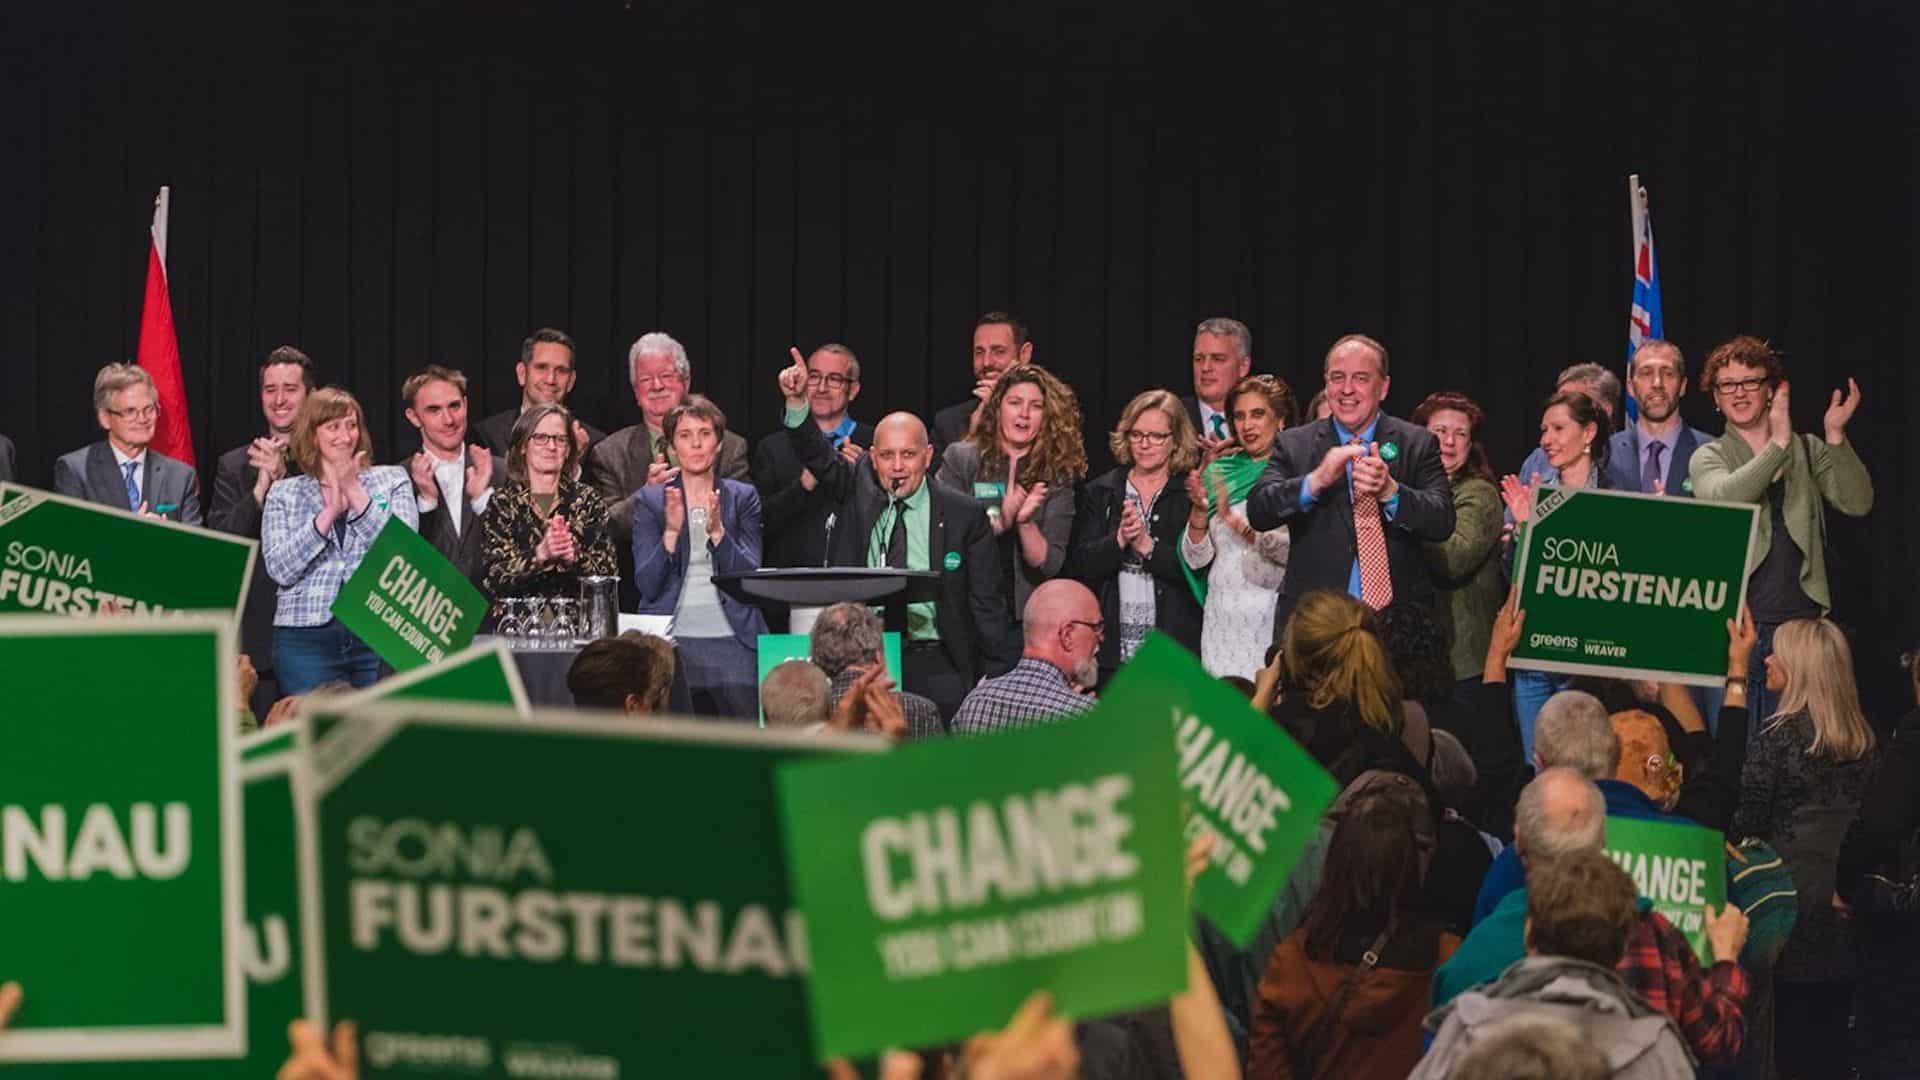 Greens emerging in Canadian political landscape